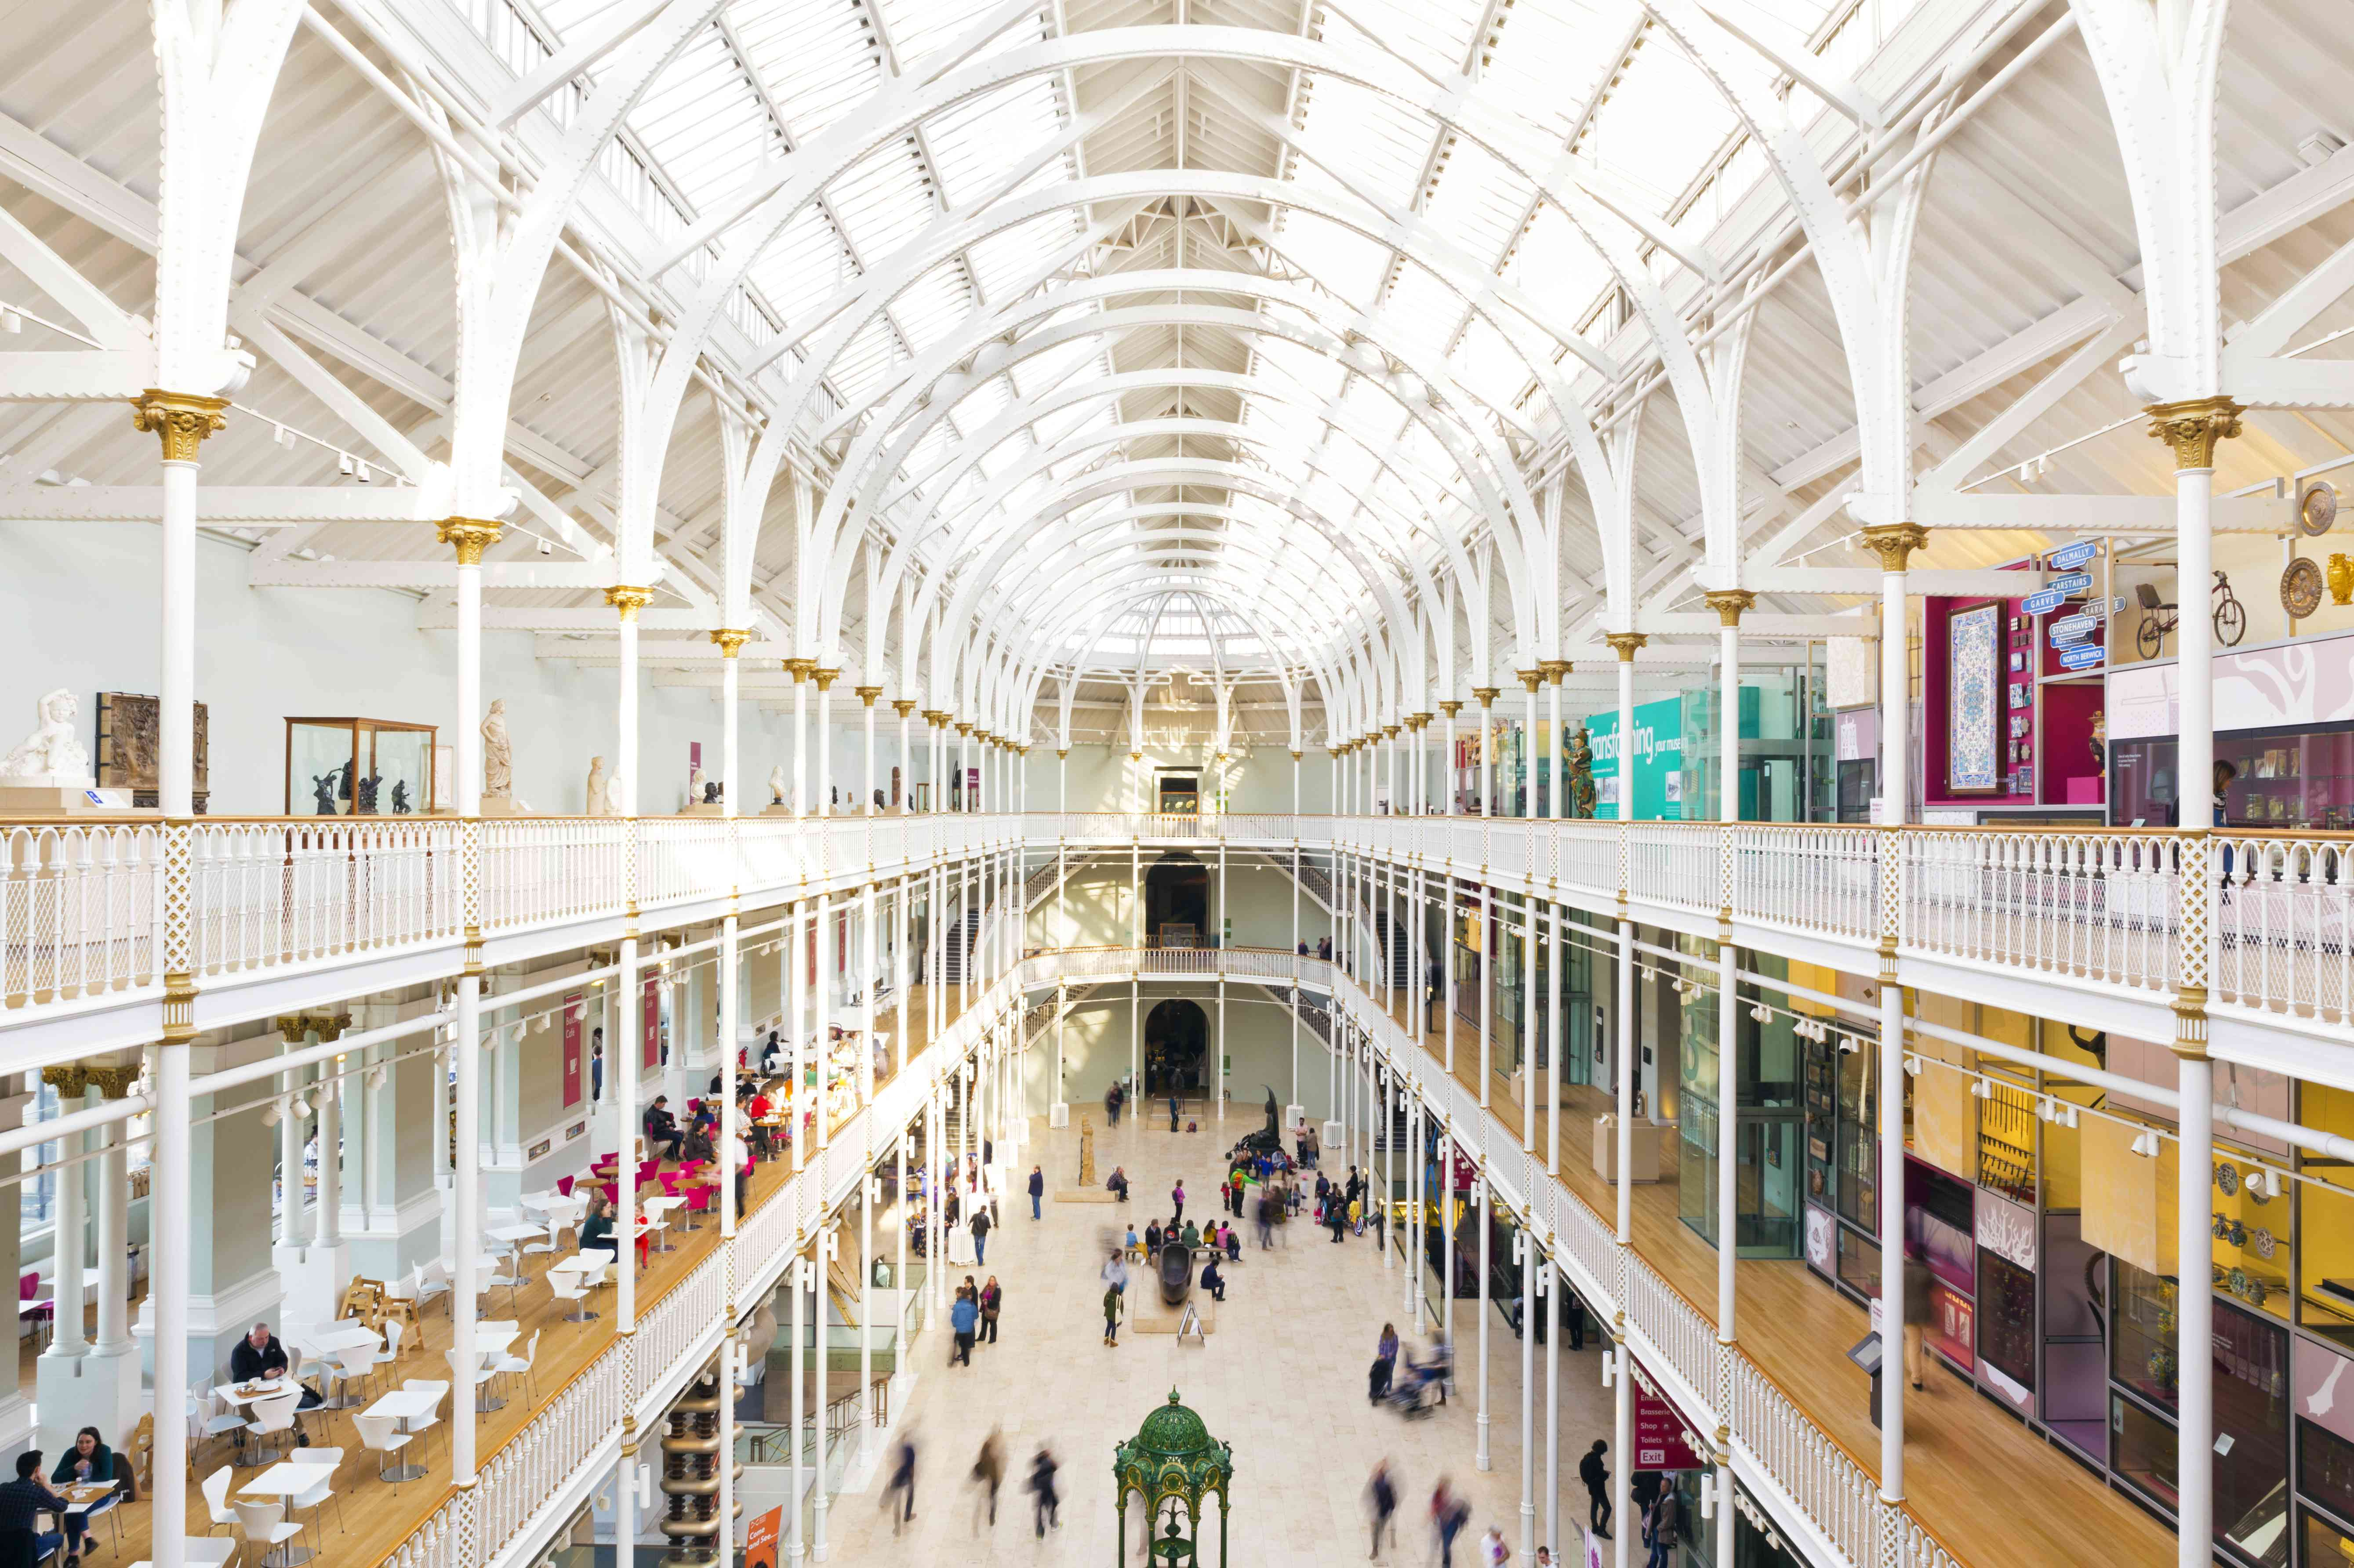 Main gallery at National Museum of Scotland, Edinburgh